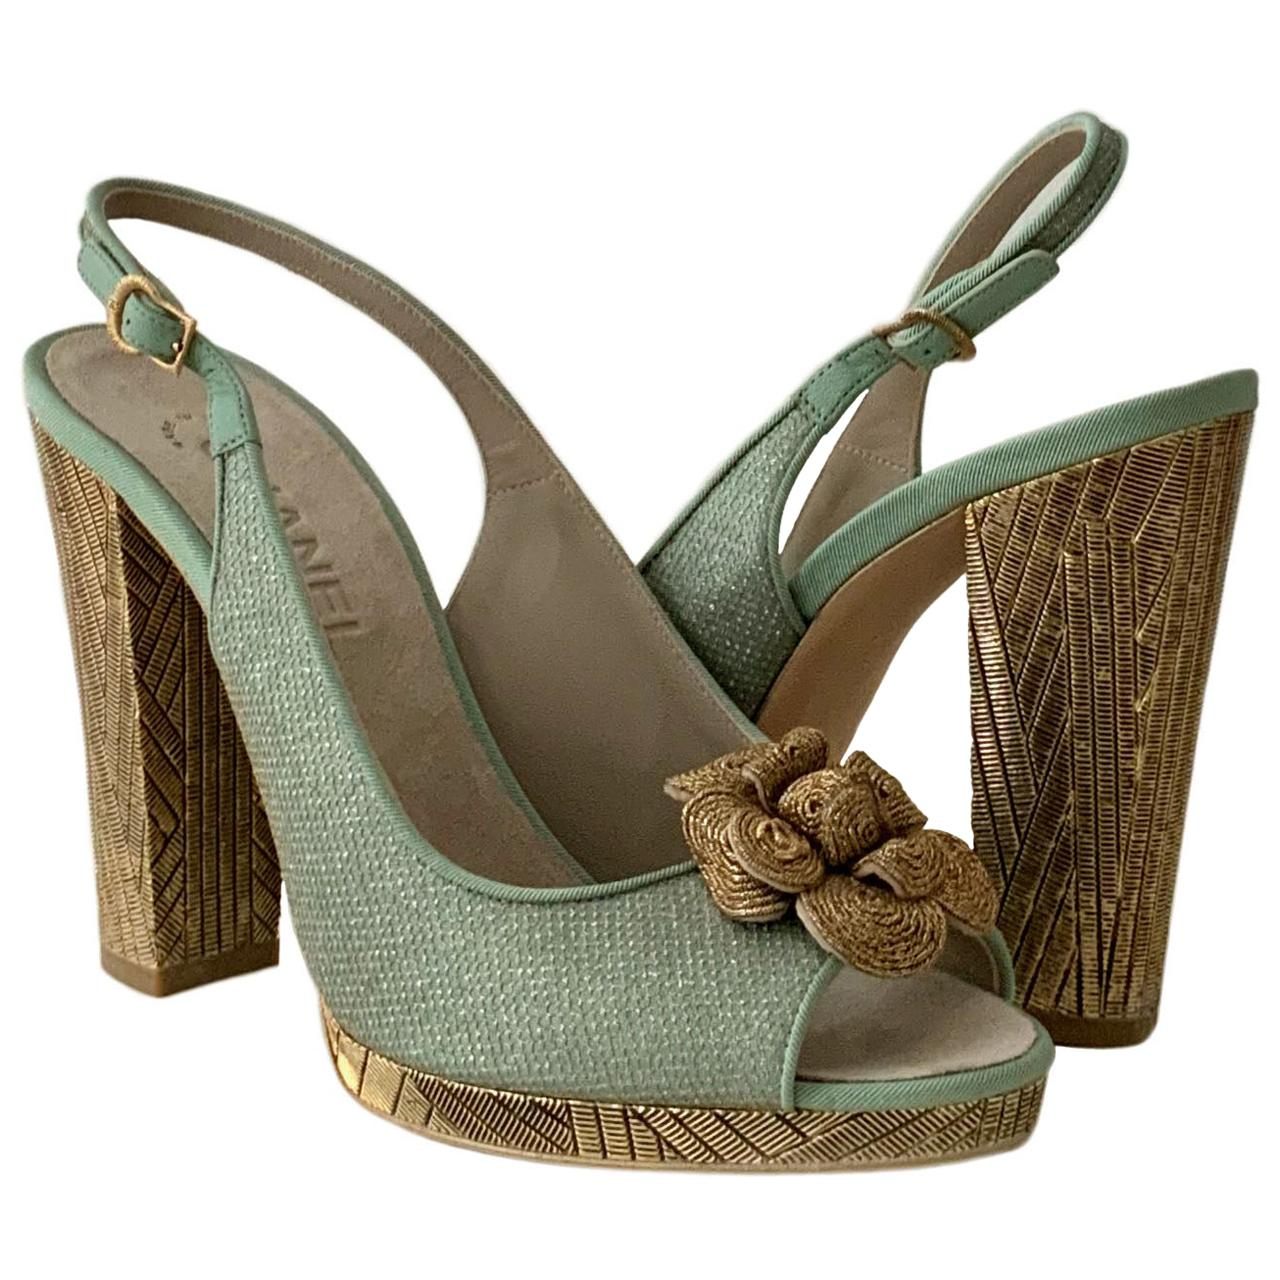 Chanel Green and Goldtone Camellia Slingback Peep-Toe Pumps